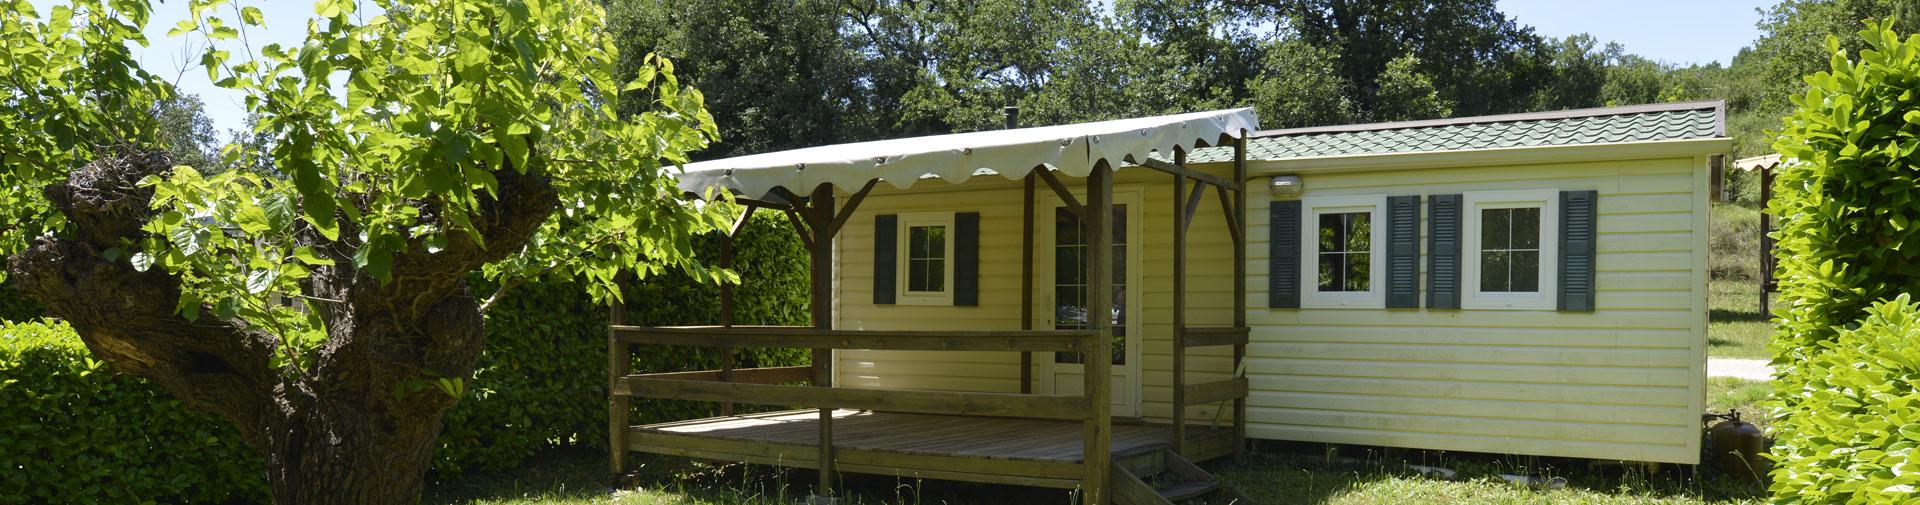 camping-gard-mobil-home-6p